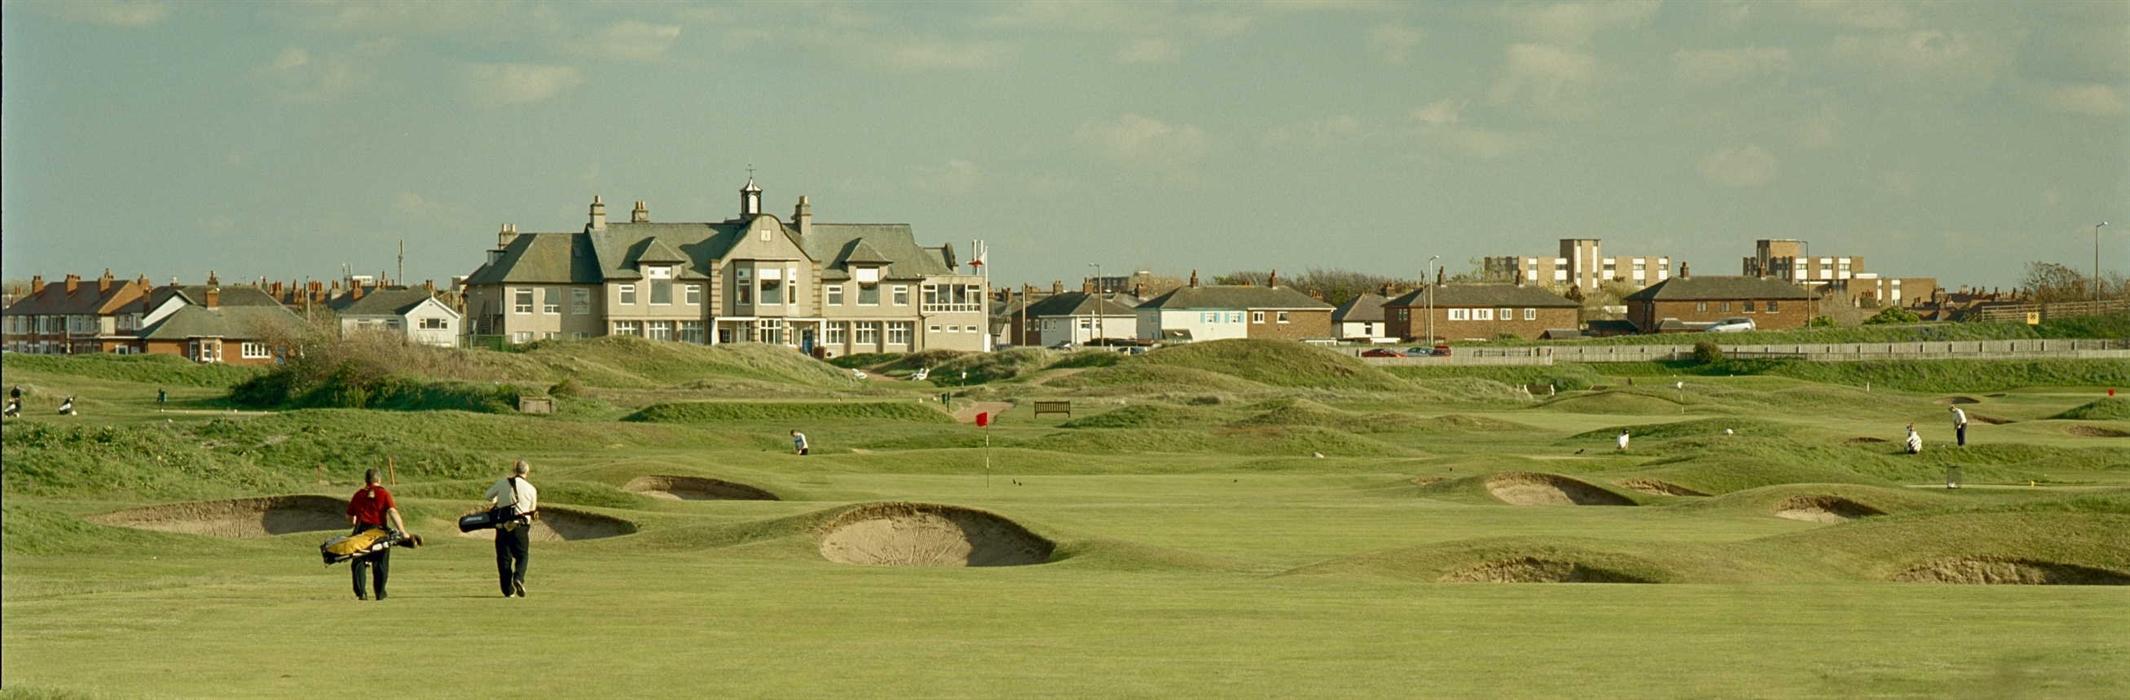 Old Links Golf Club